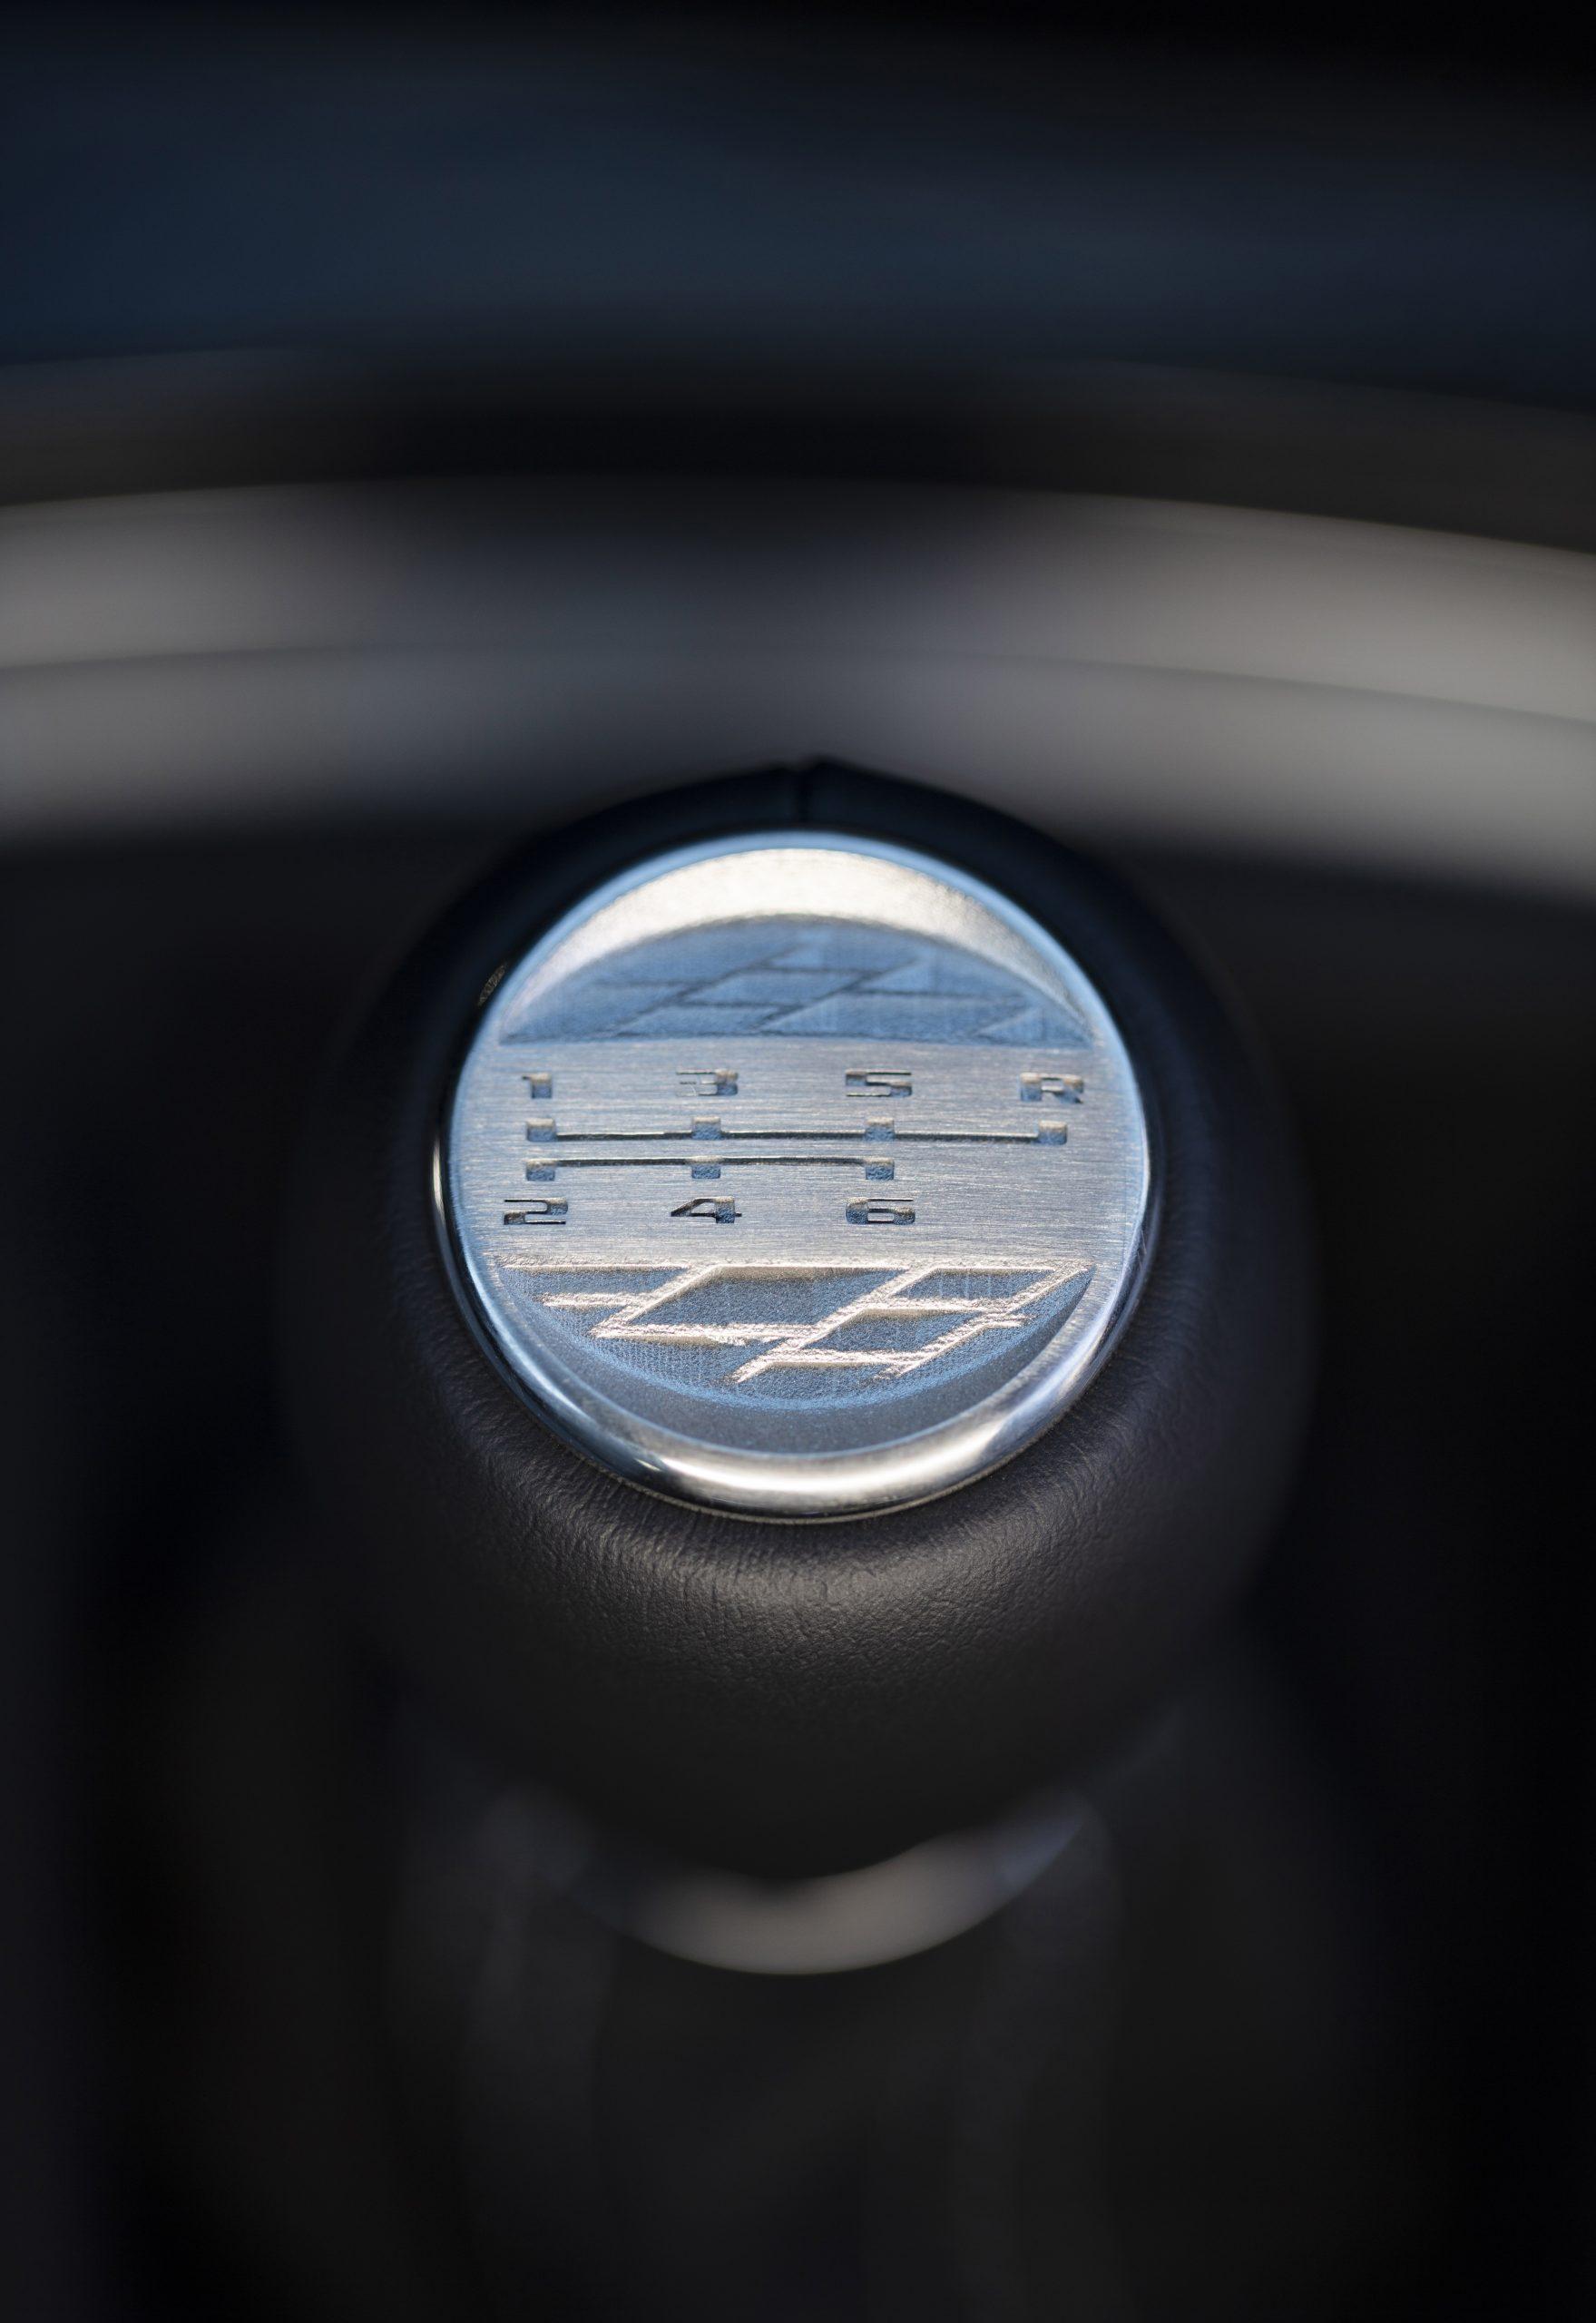 The V-Series Blackwing shift pattern medallion